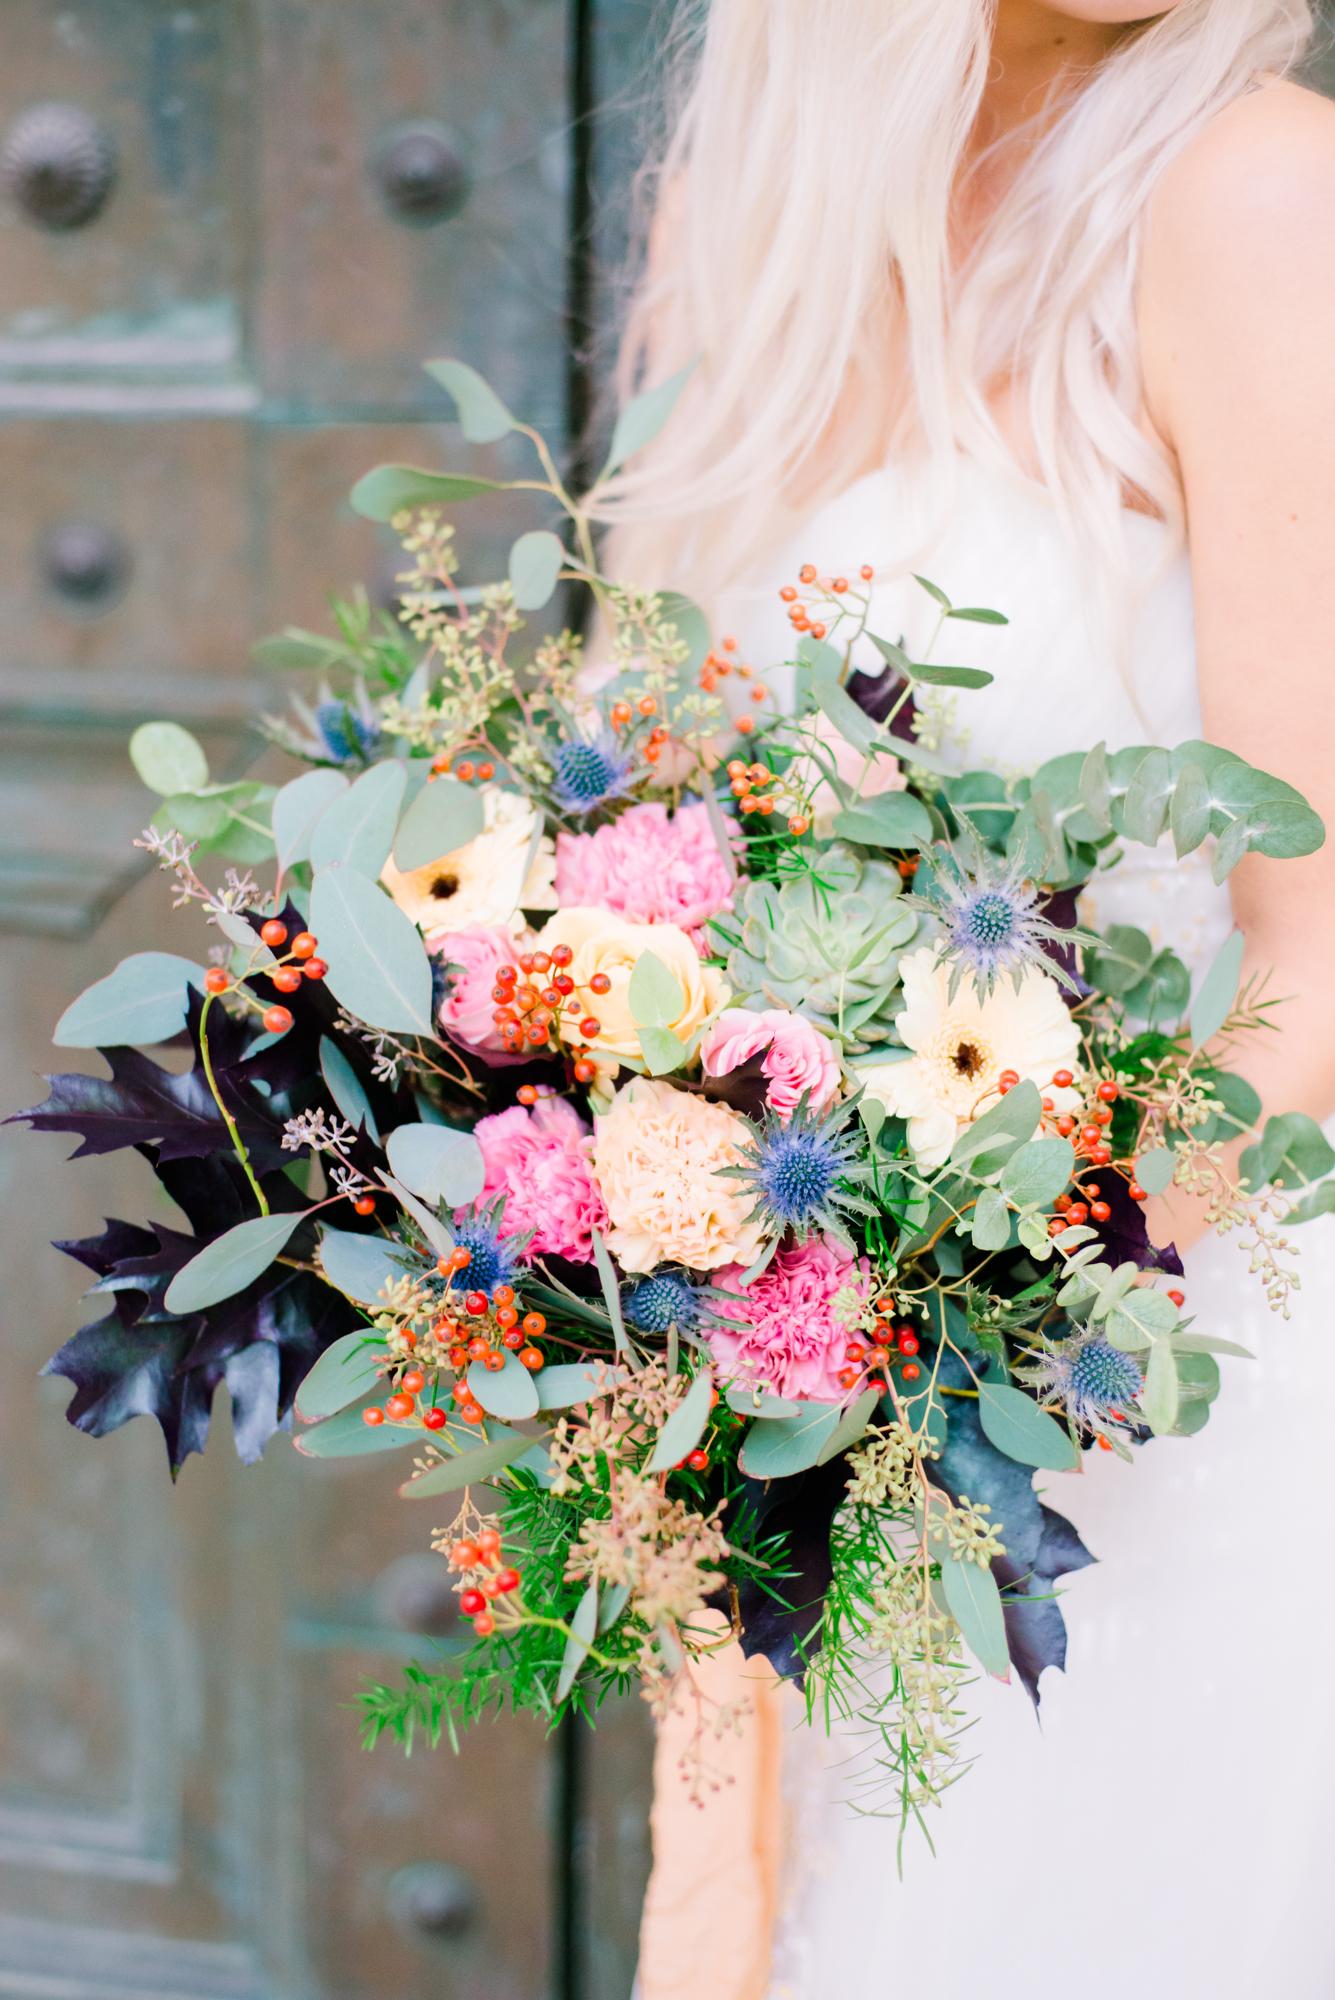 Elegant Organic Fall Swedish Bridal Wedding Styled Shoot - Erika Alvarenga Photography-53.jpg